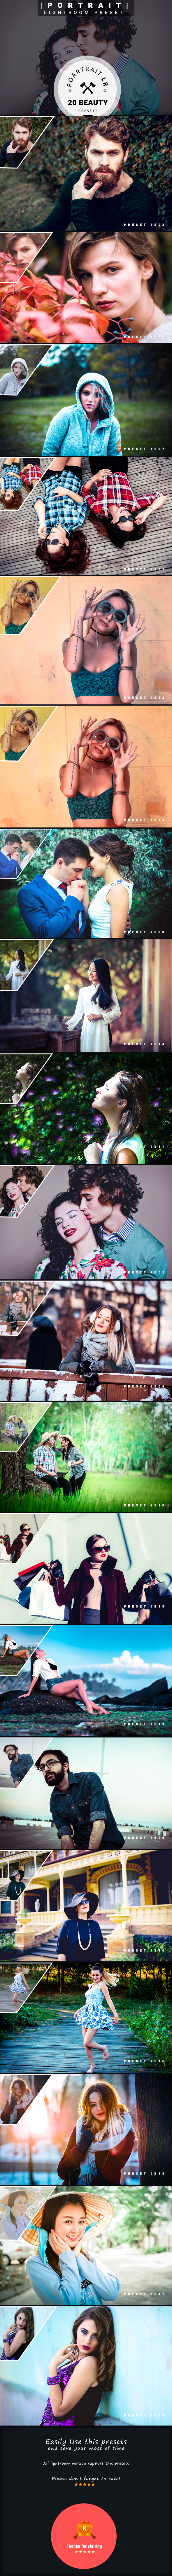 20 Beauty Portrait | Lightroom Presets - Portrait Lightroom Presets